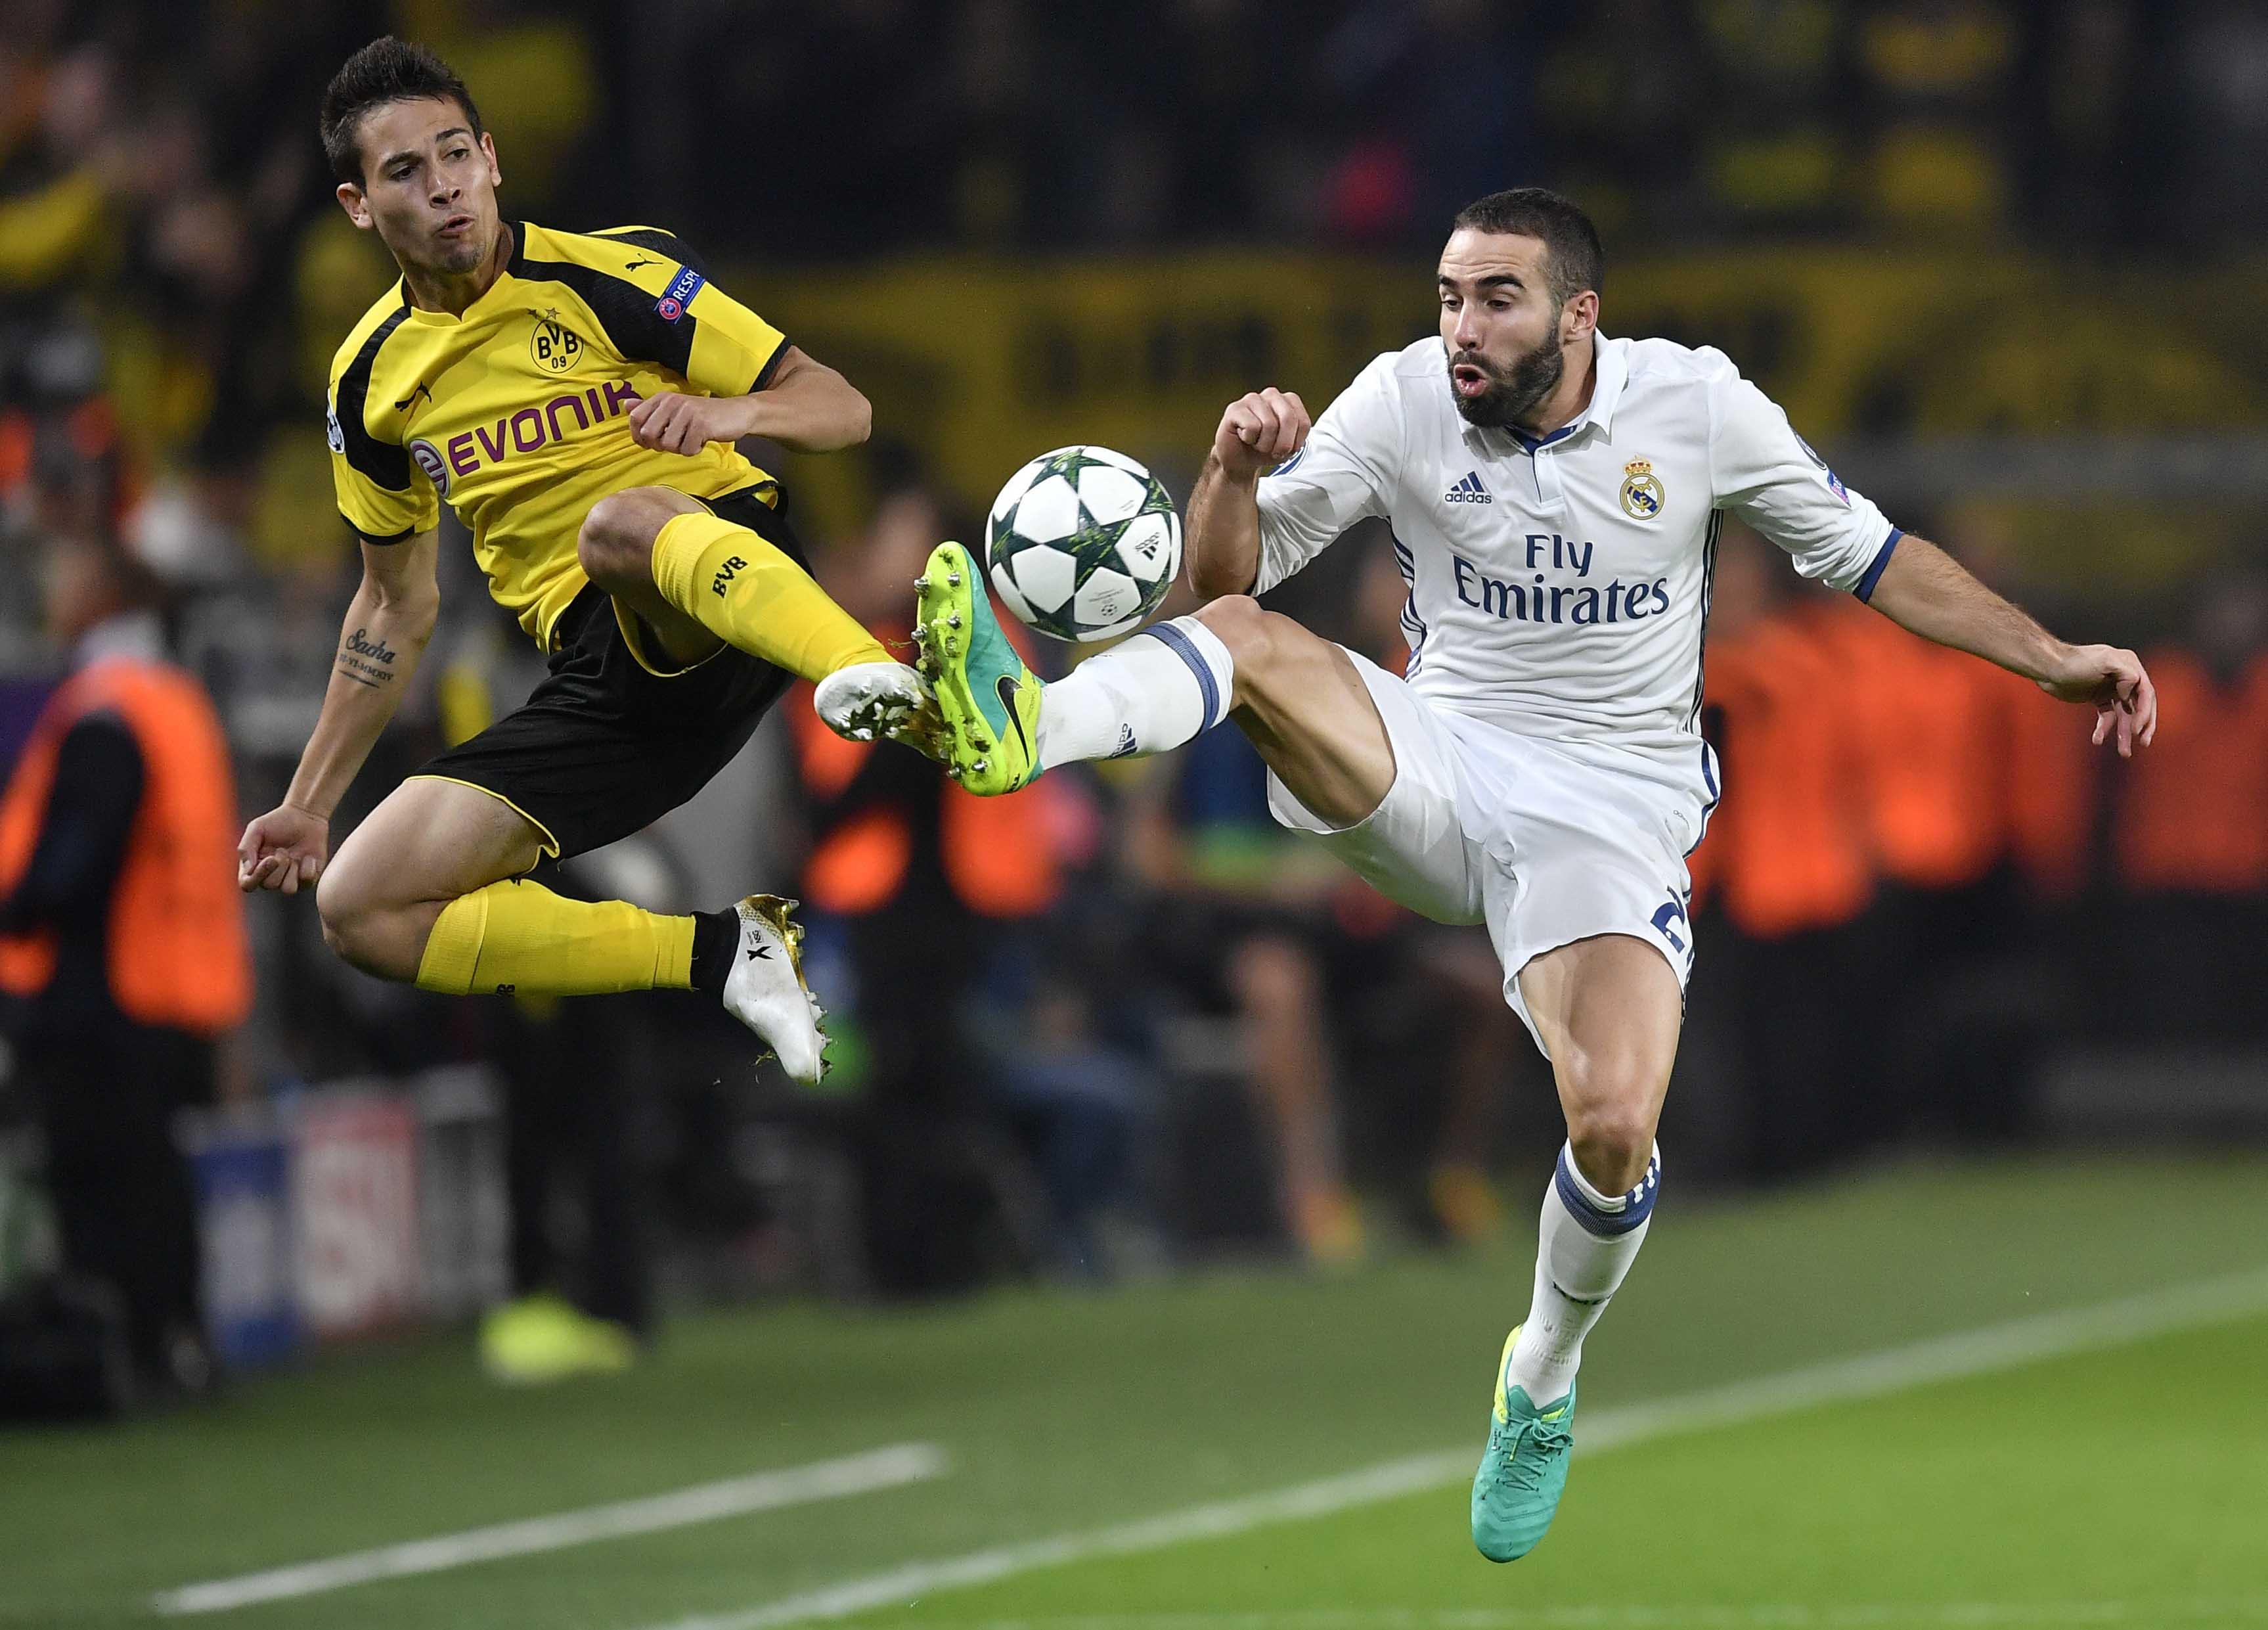 Ronaldo scores but Dortmund rallies in latest Madrid setback